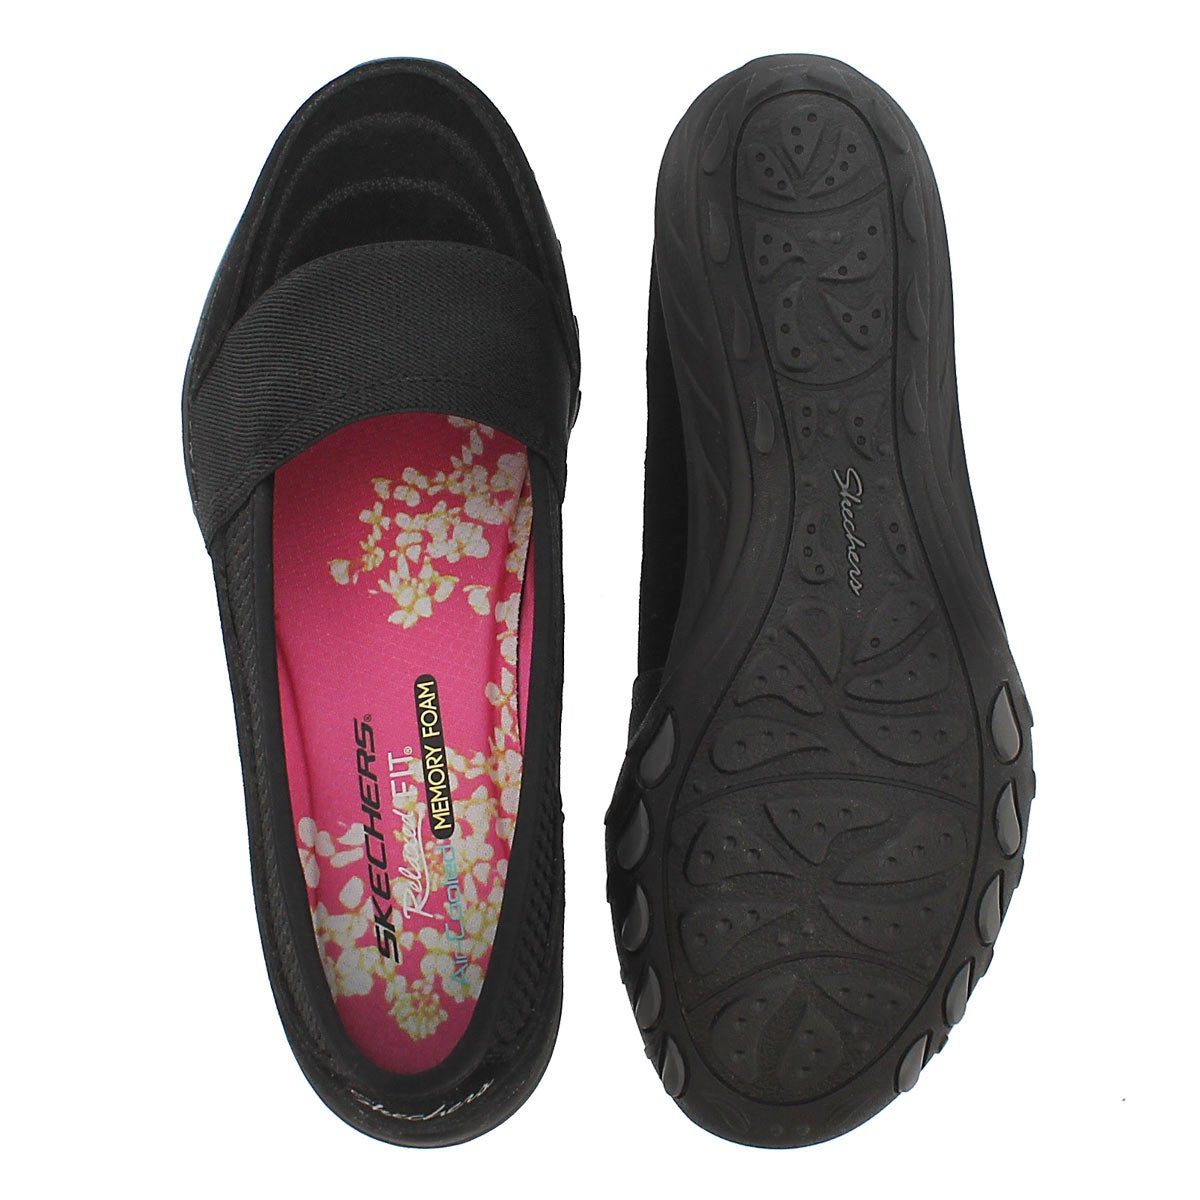 Lds Savvy black slip on casual shoe